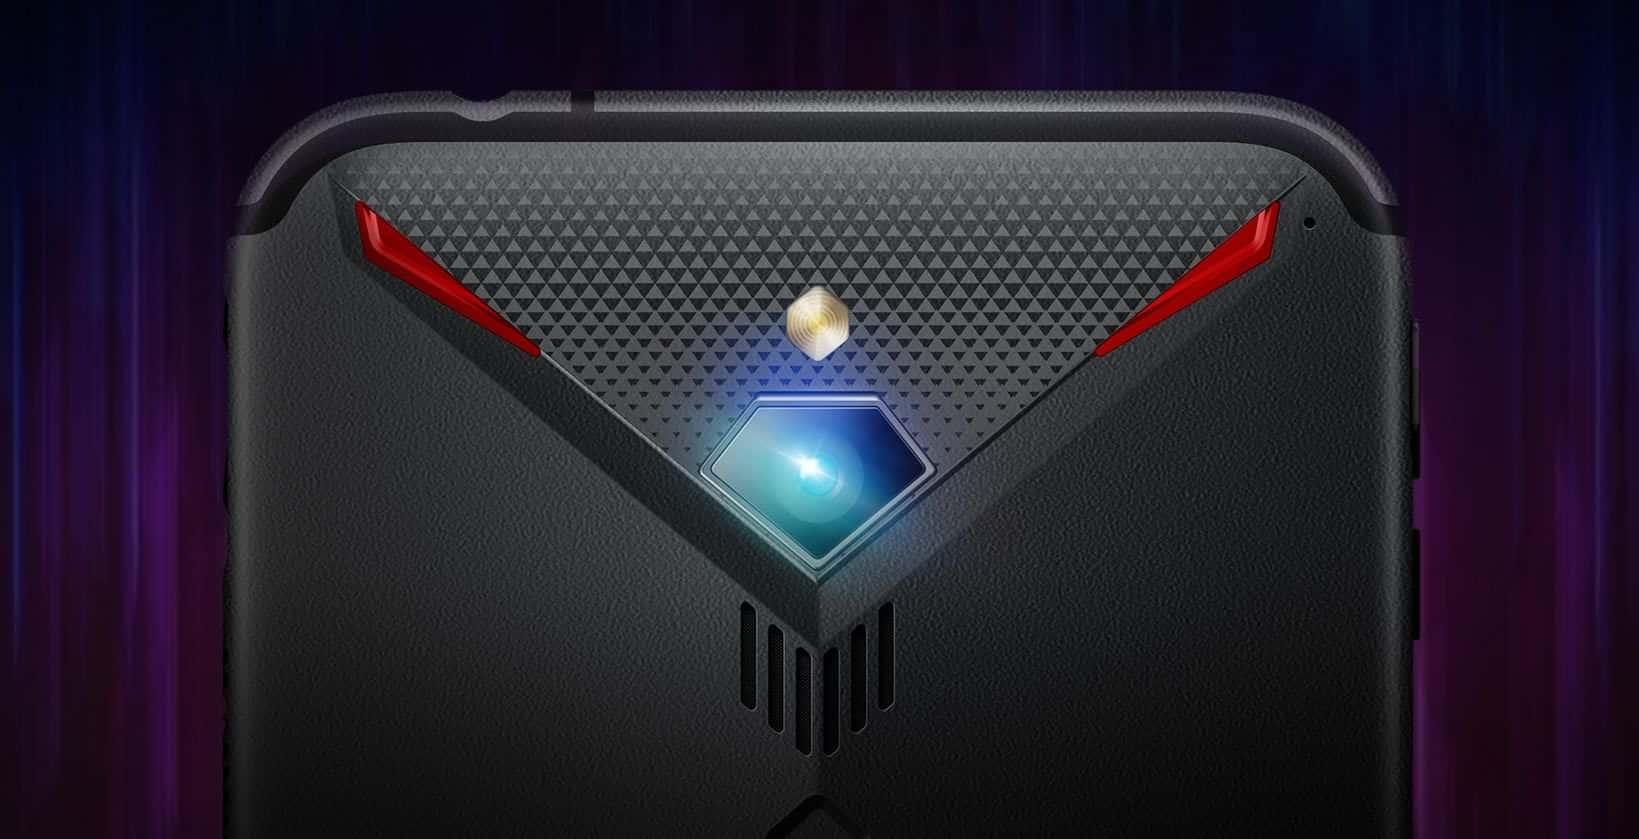 Nubia เปิดตัว Red Magic 3 มือถือเพื่อการเล่นเกม ใช้ SNAP855 จอ 90 Hz มีพัดลมระบายอากาศ 6